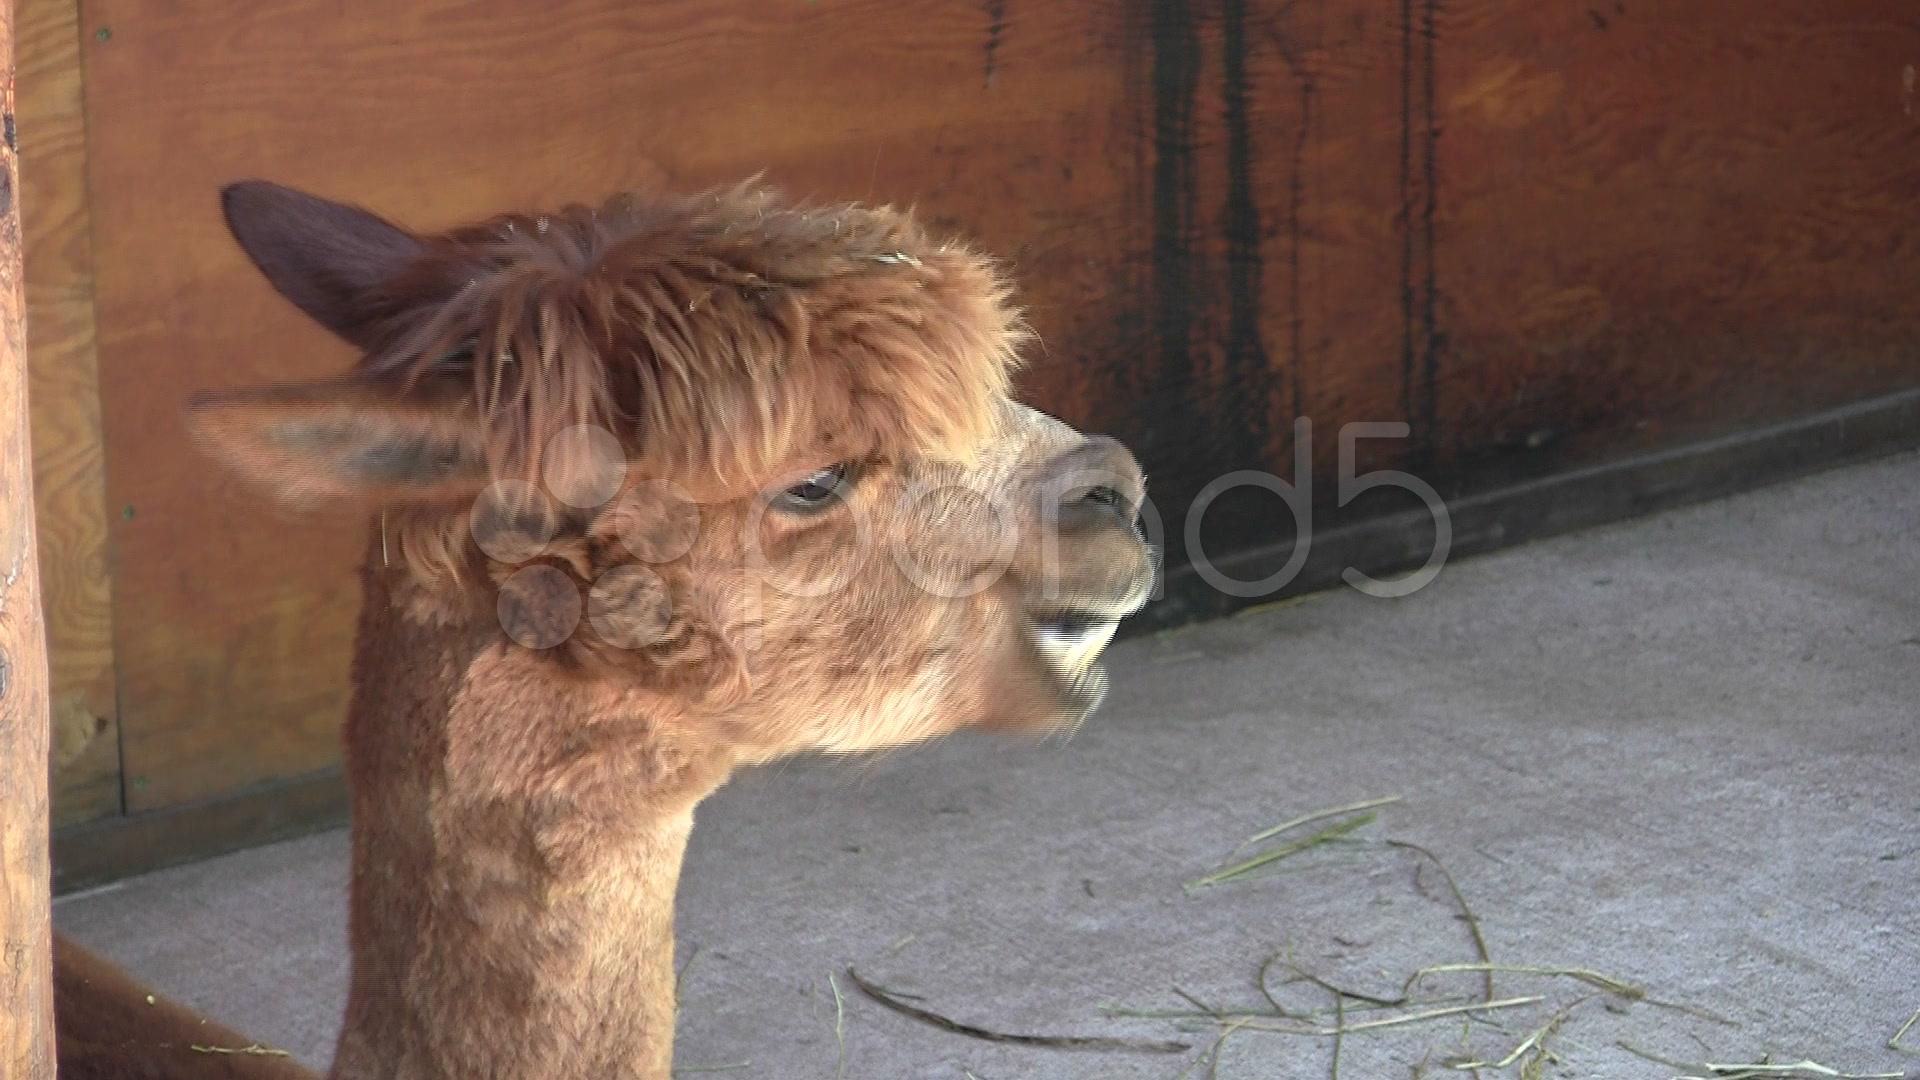 008156858-alpaca-chewing